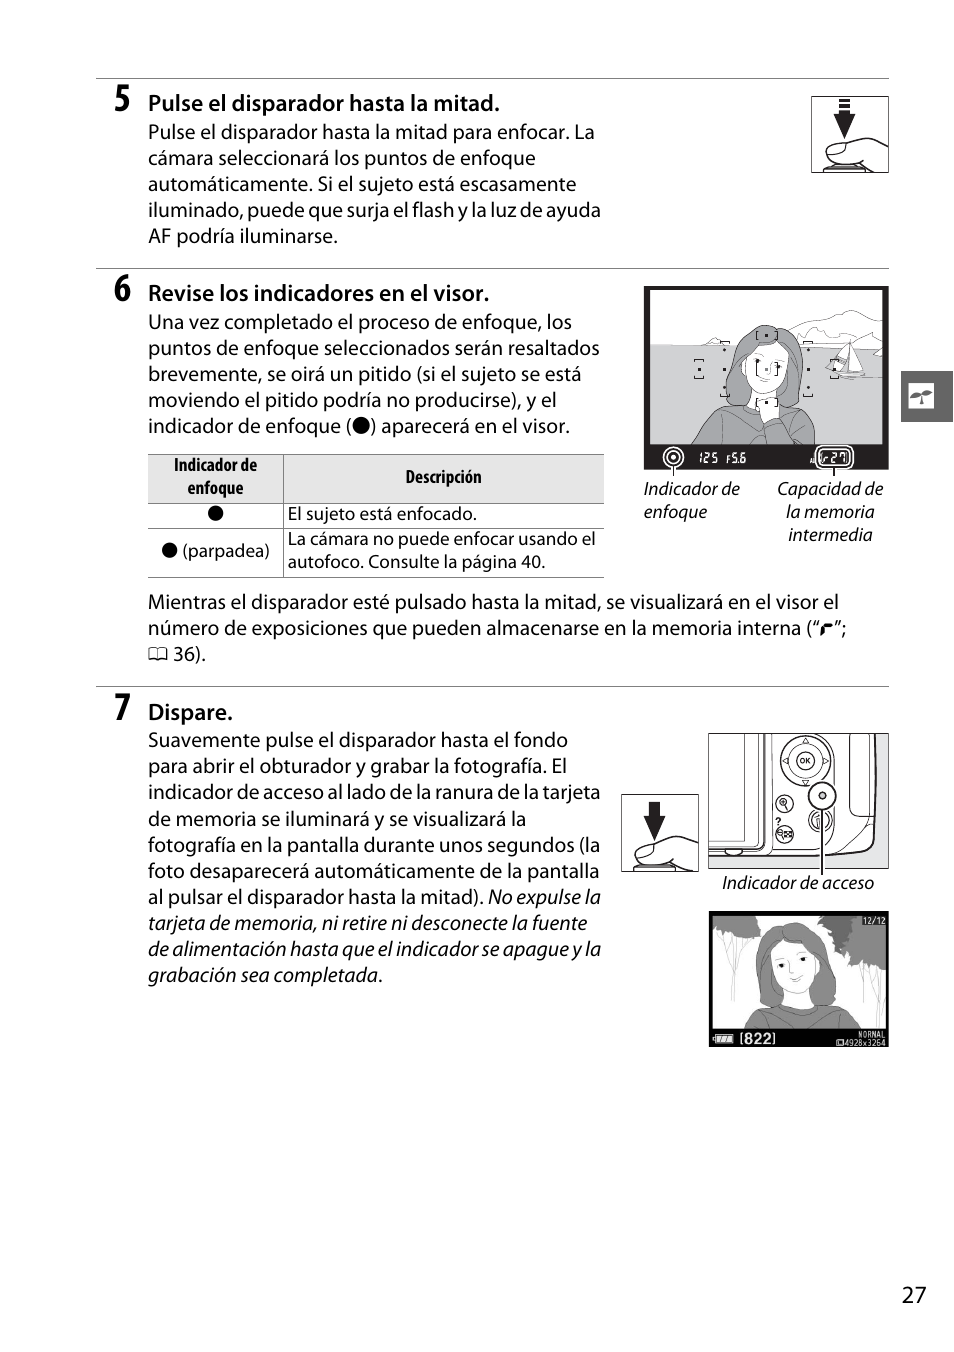 nikon d5100 manual del usuario p gina 45 260 original rh pdfmanuales com manual de usuario nikon d5100 español manual del usuario nikon d5100